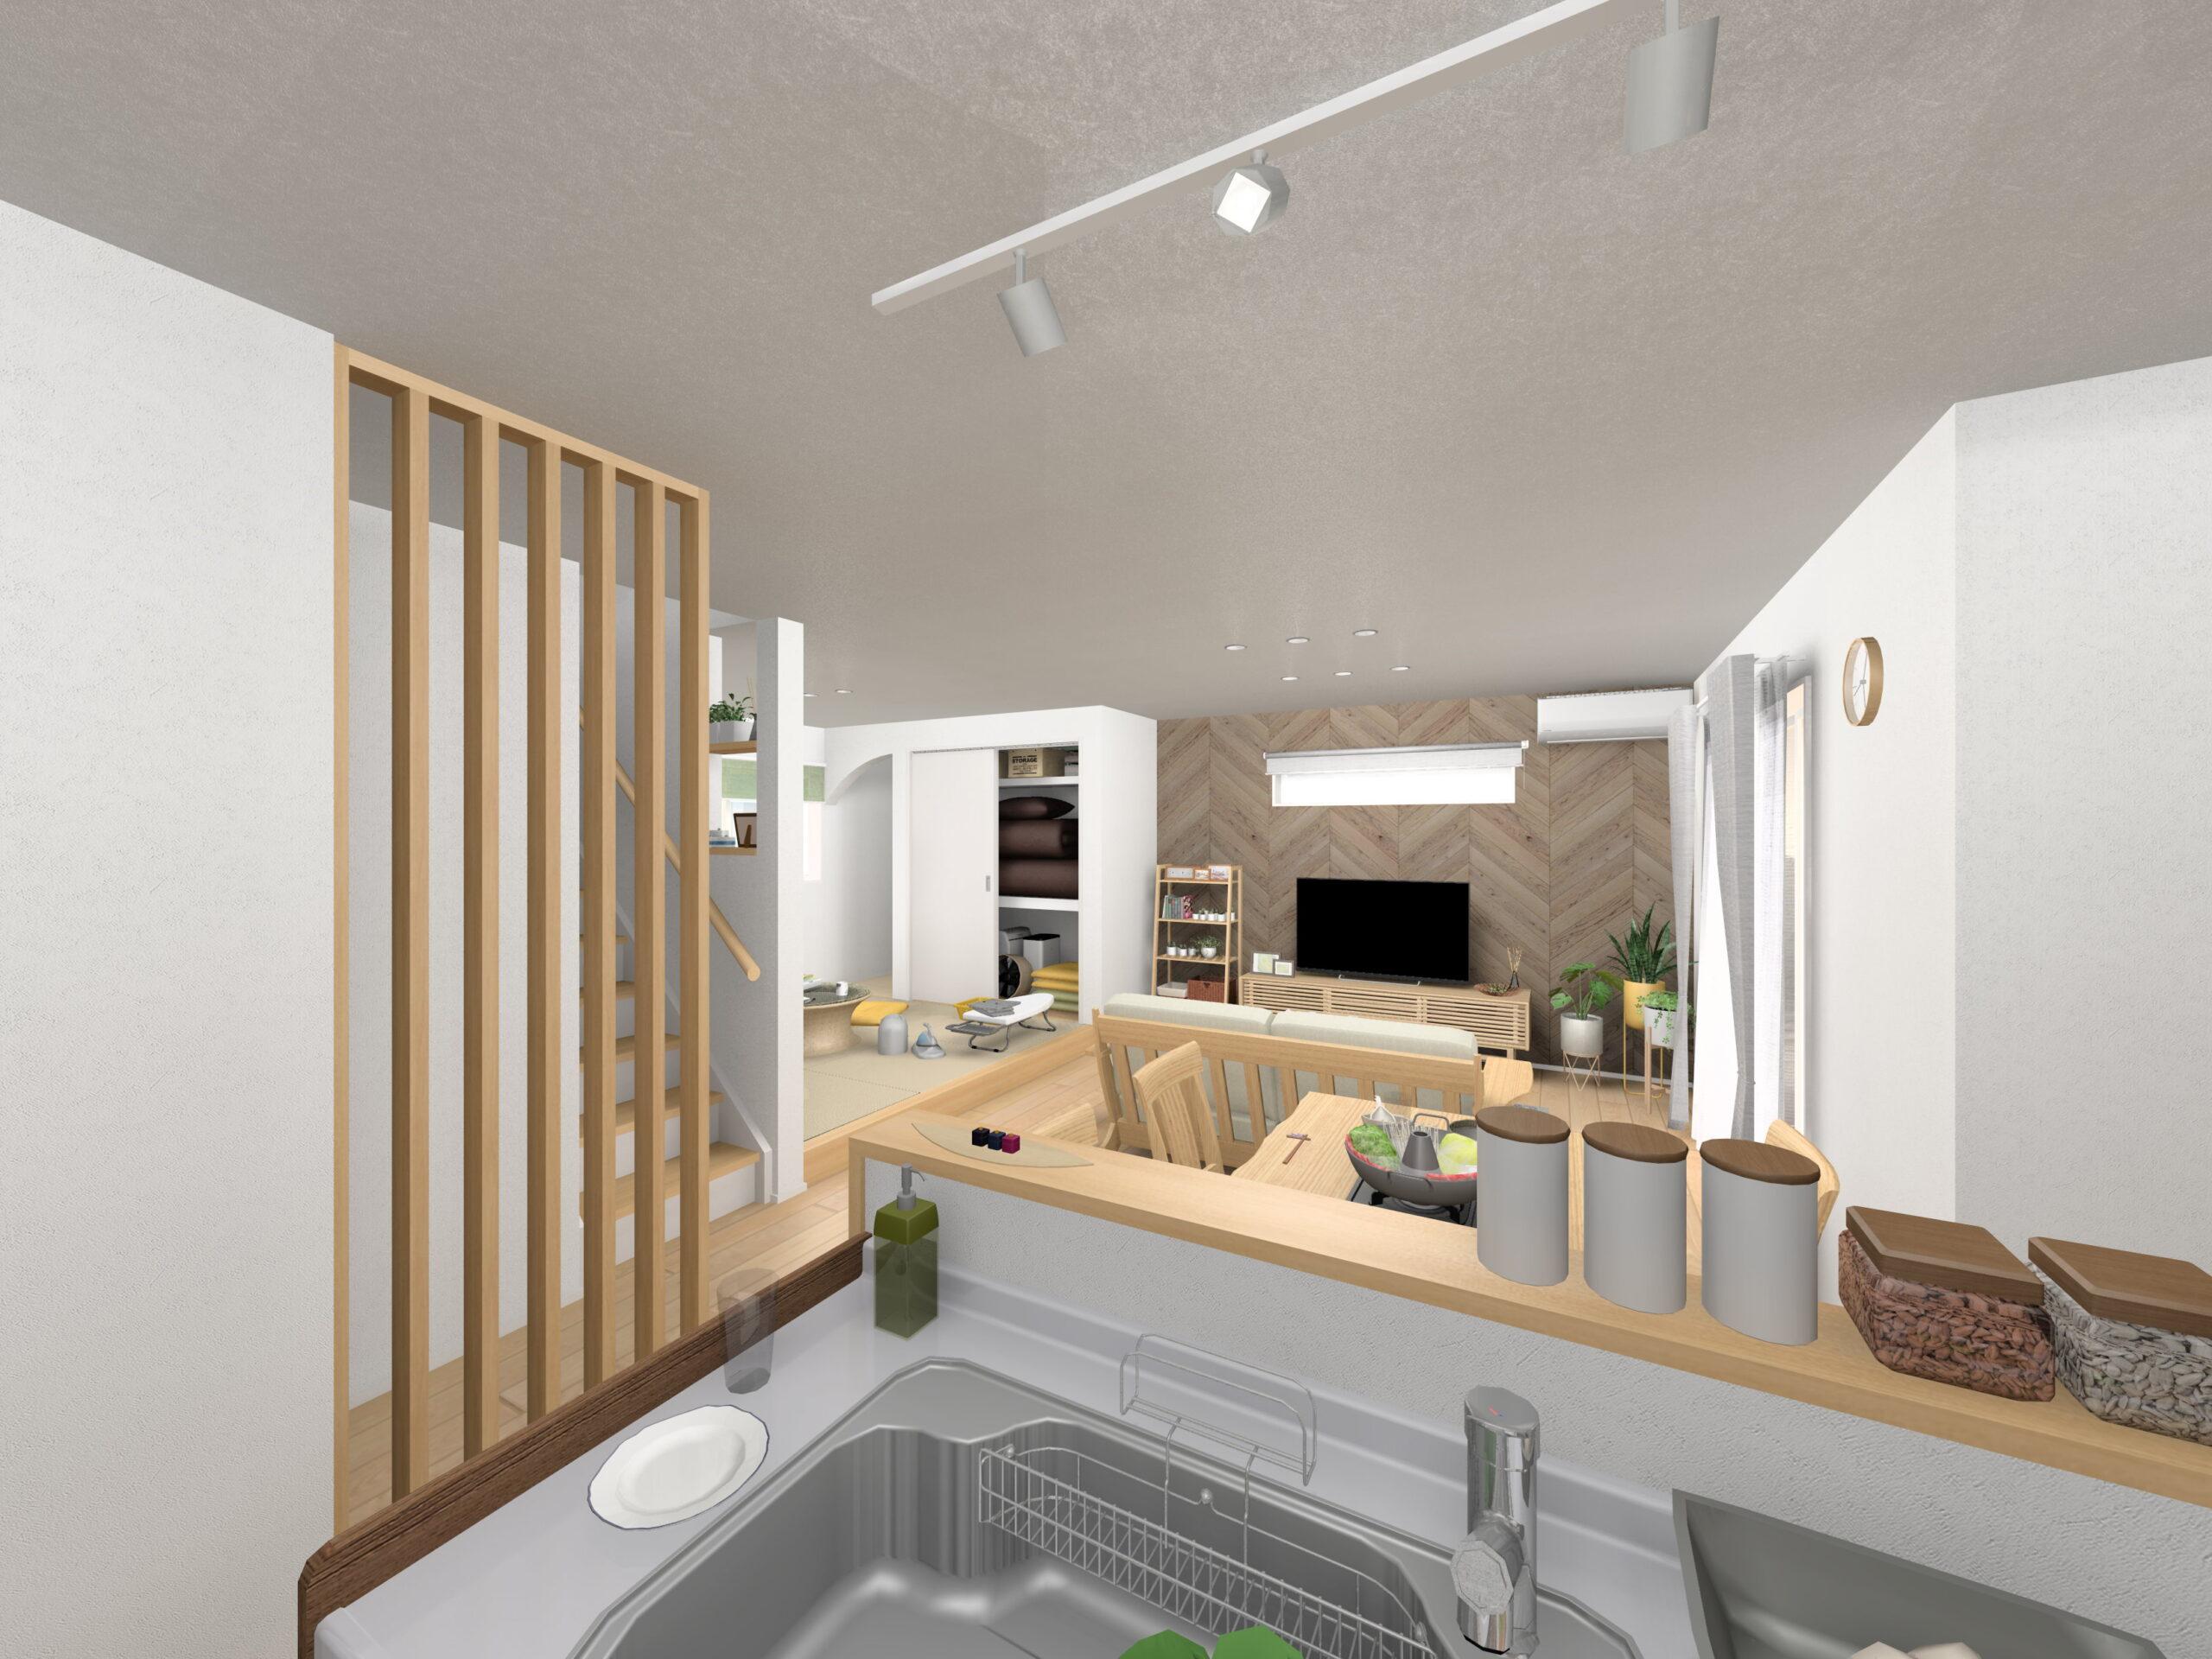 嬉野市新築建売住宅「OURS下野2号地」LDKパース